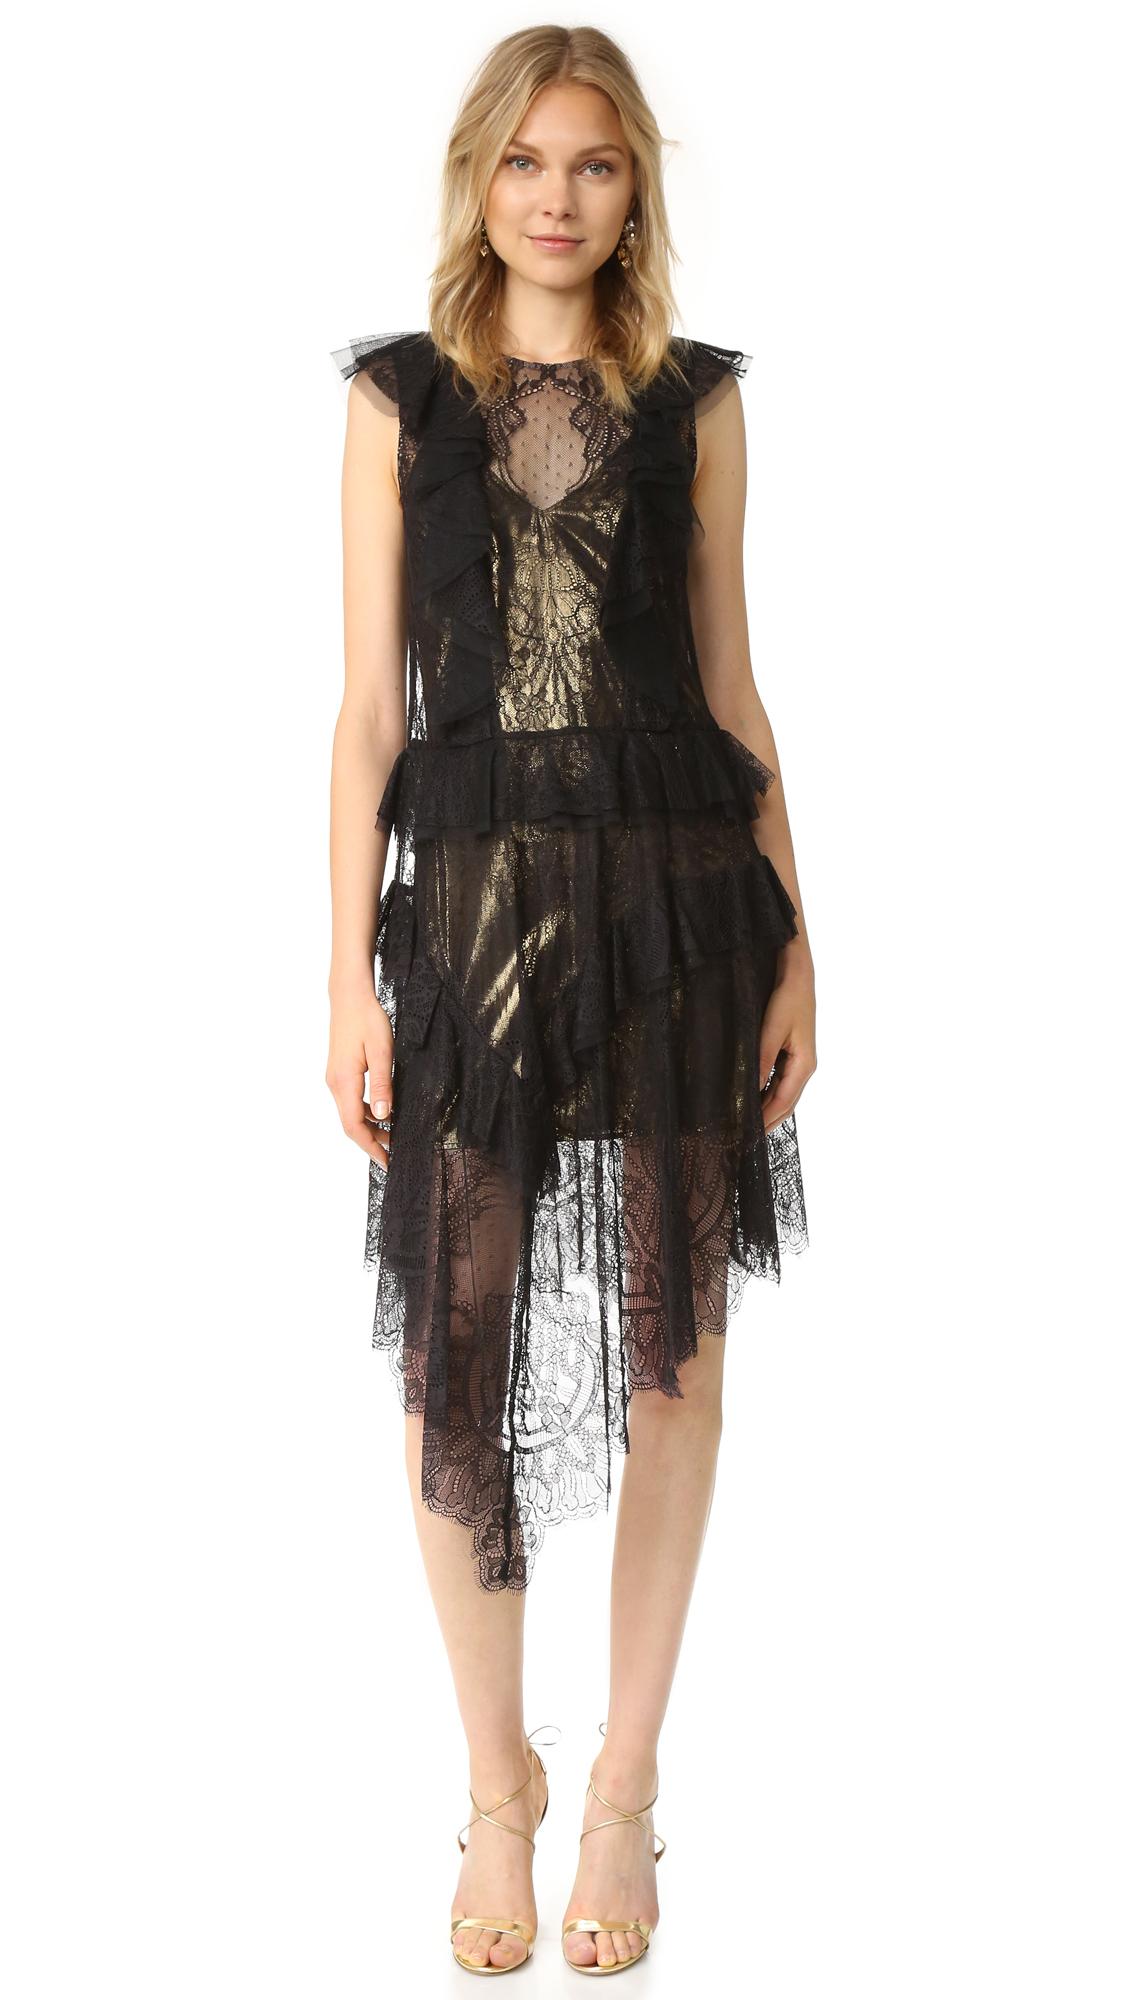 Bcbgmaxazria Lace Ruffle Kailin Dress - Black at Shopbop